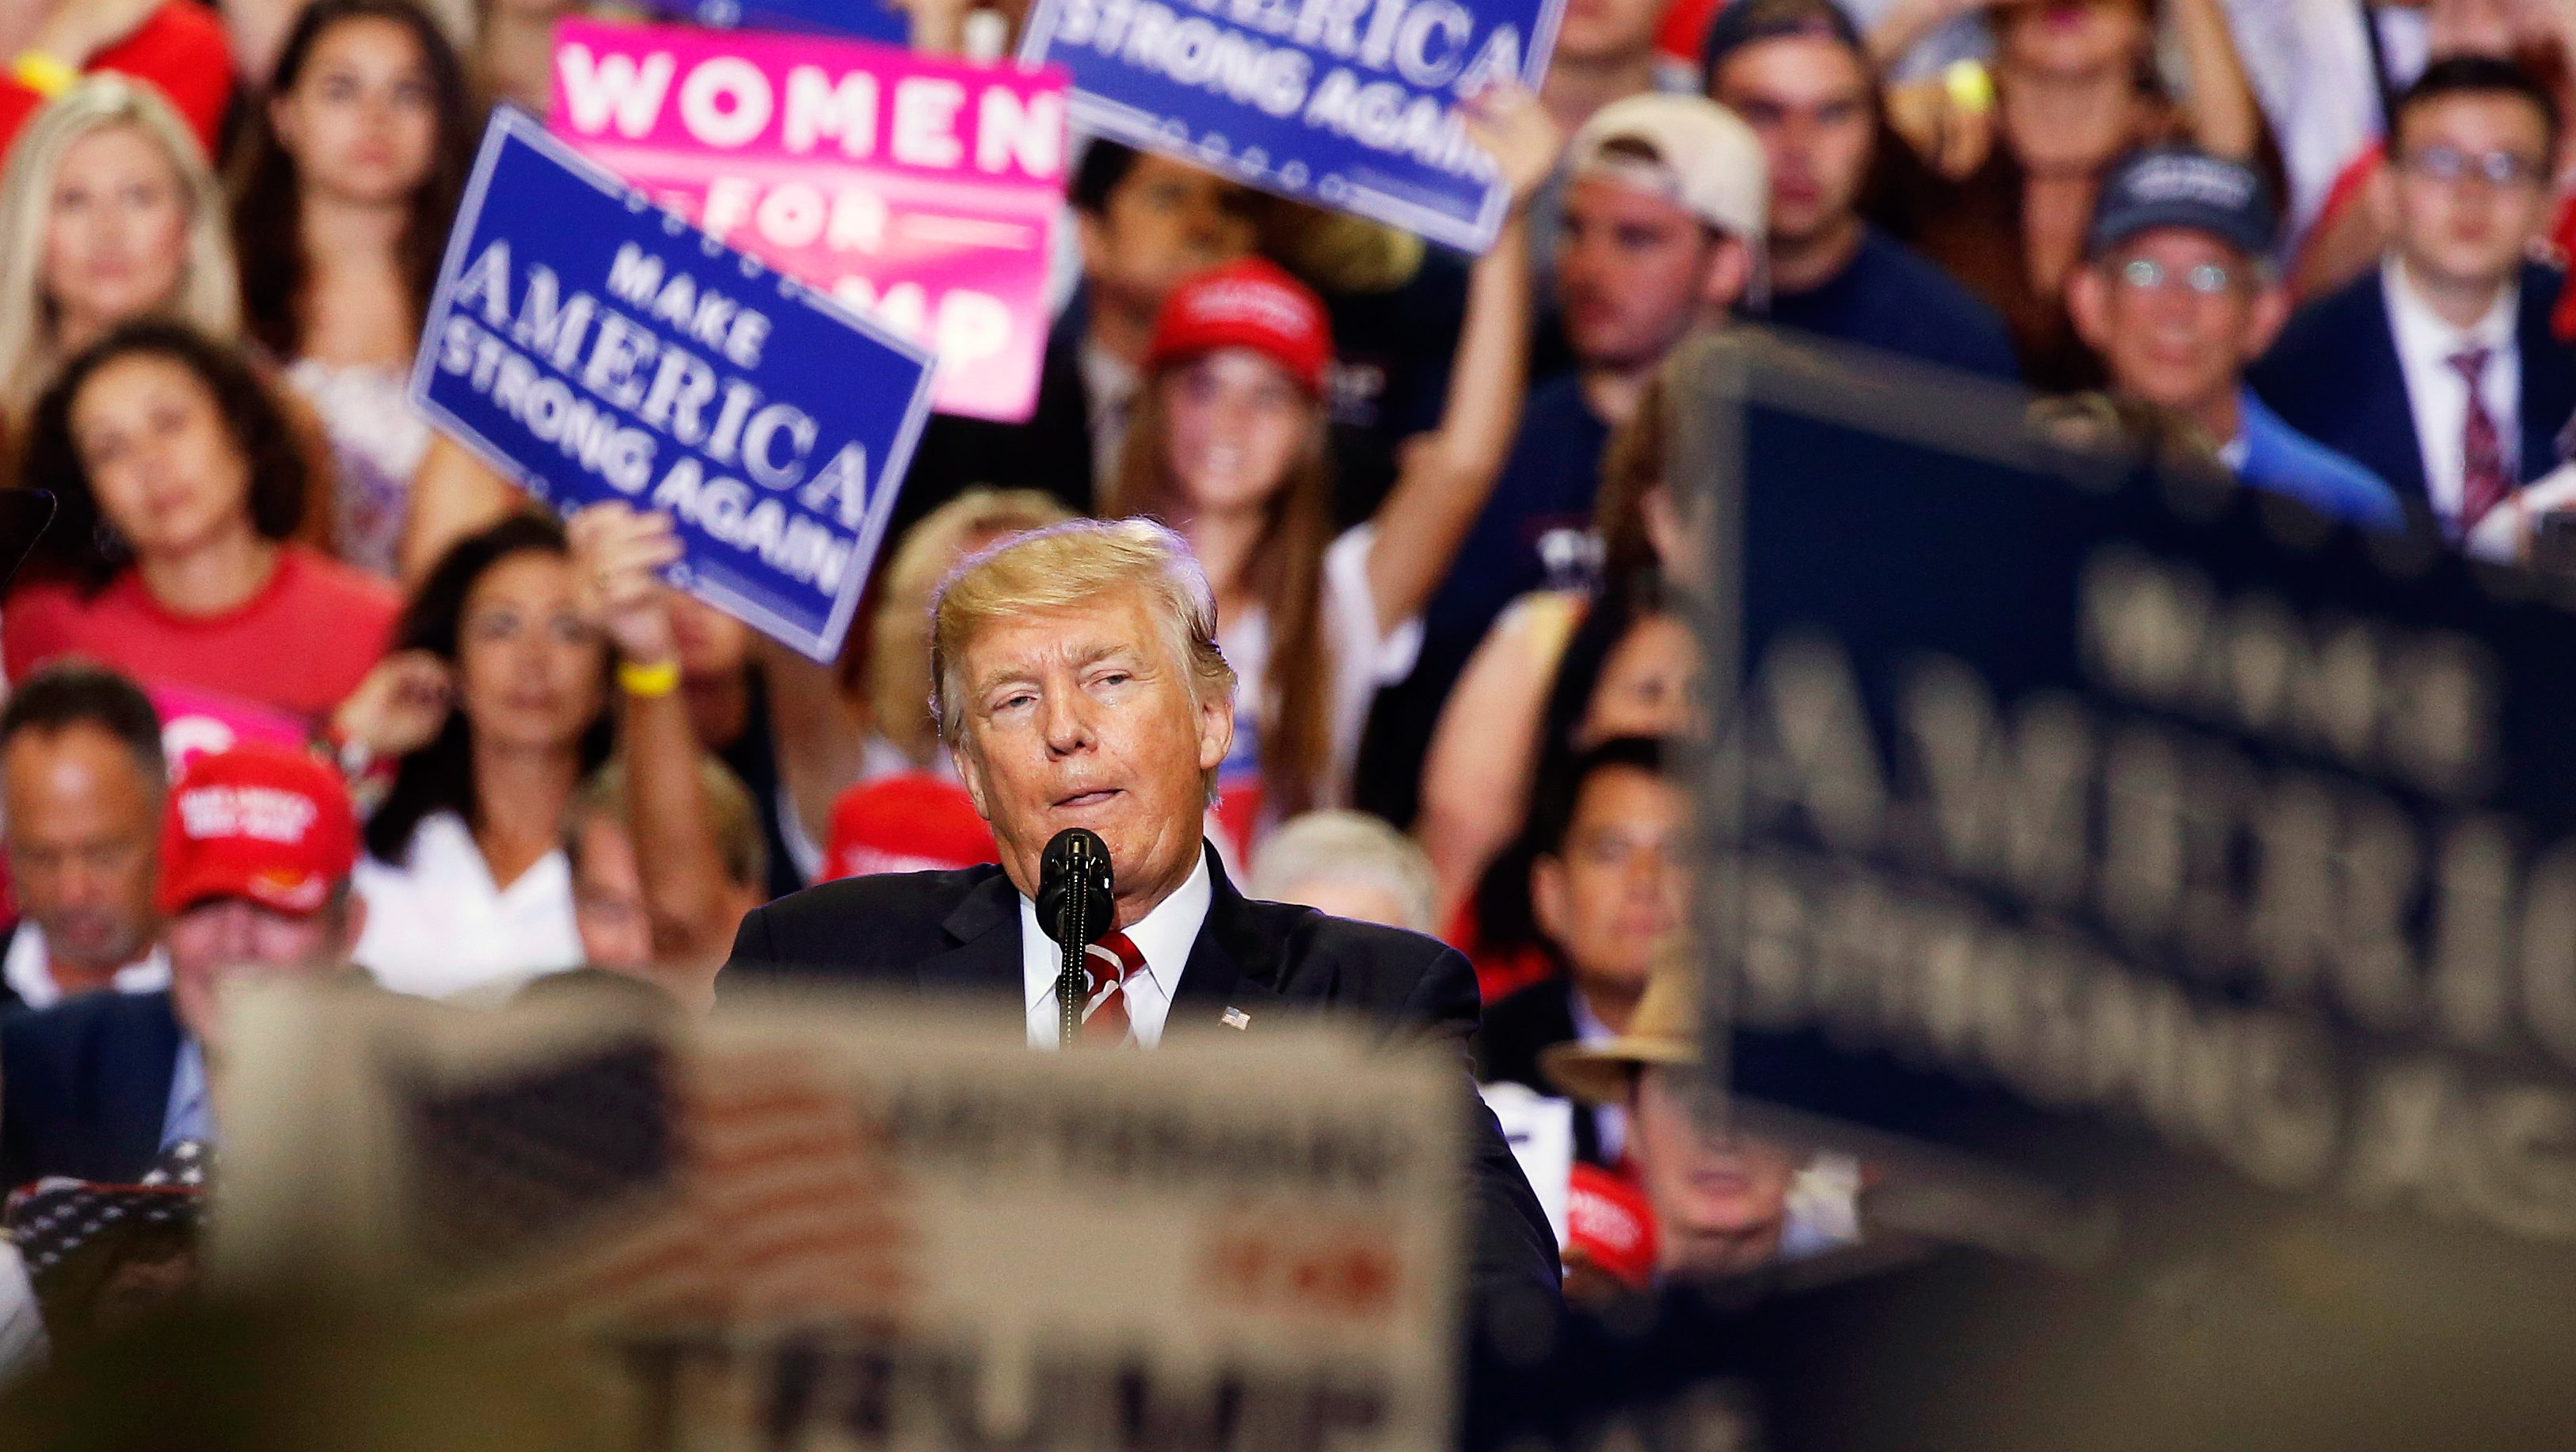 U.S. President Donald Trump speaks at a campaign rally in Phoenix, Arizona, U.S., August 22, 2017.